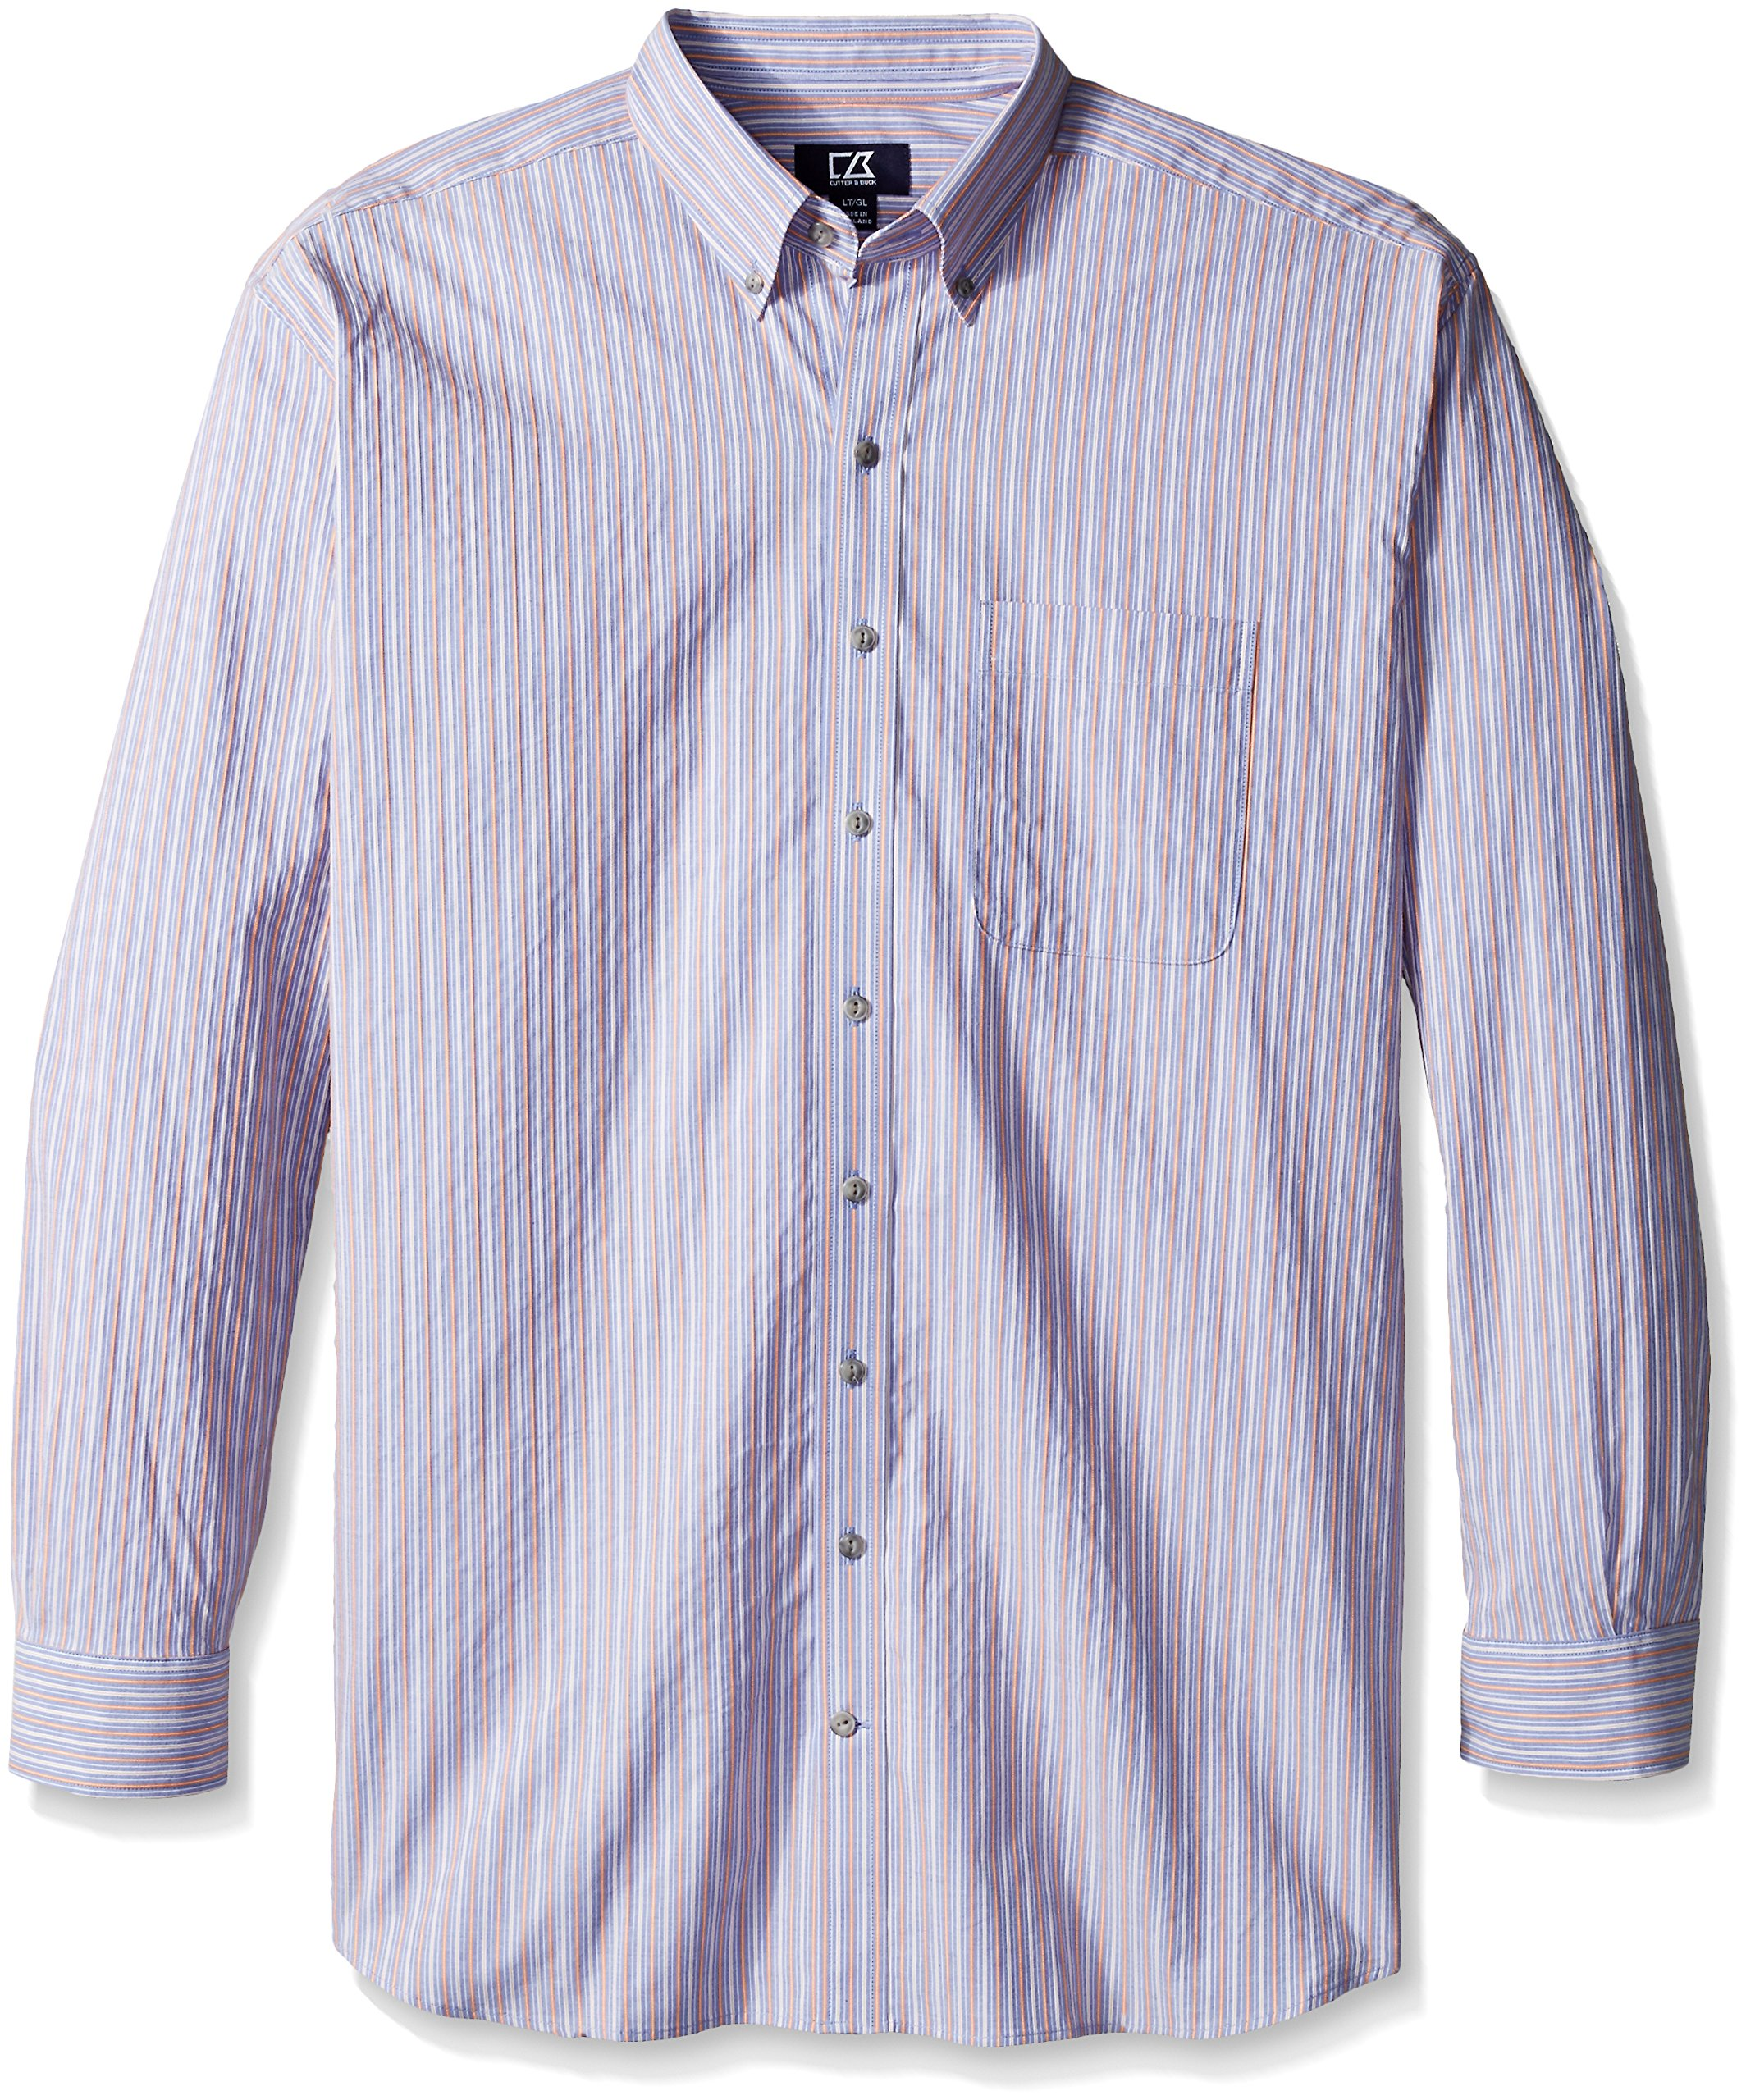 Cutter & Buck Men's Big and Tall Long Sleeve Sundown Stripe Shirt, Multi, 2X/Big